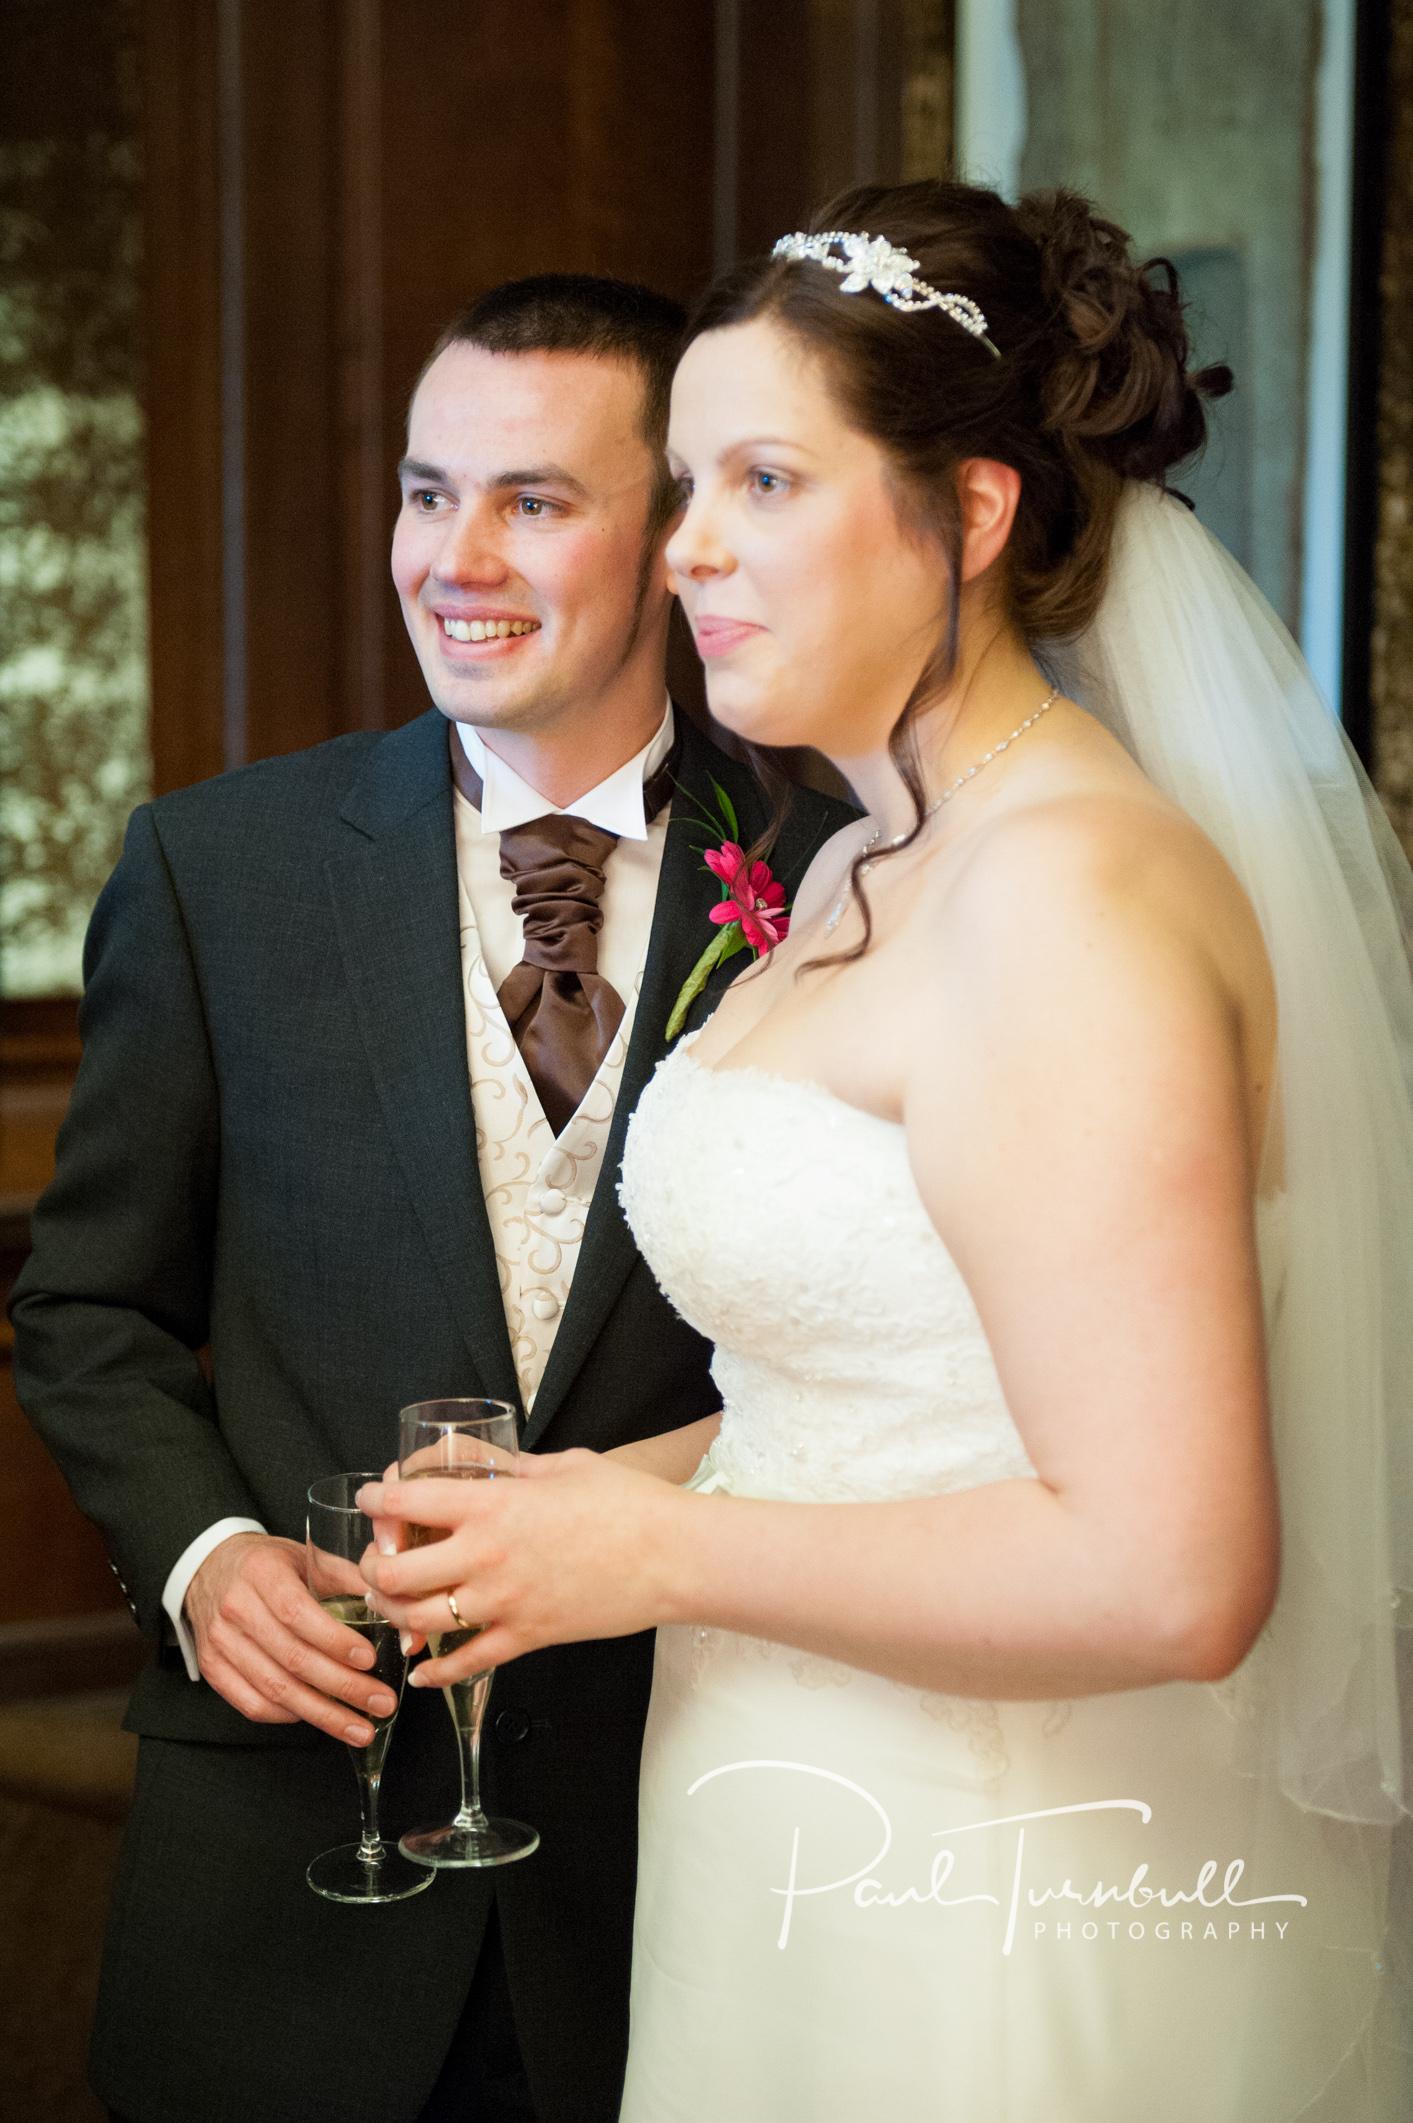 wedding-photography-wood-hall-wetherby-yorkshire-036.jpg